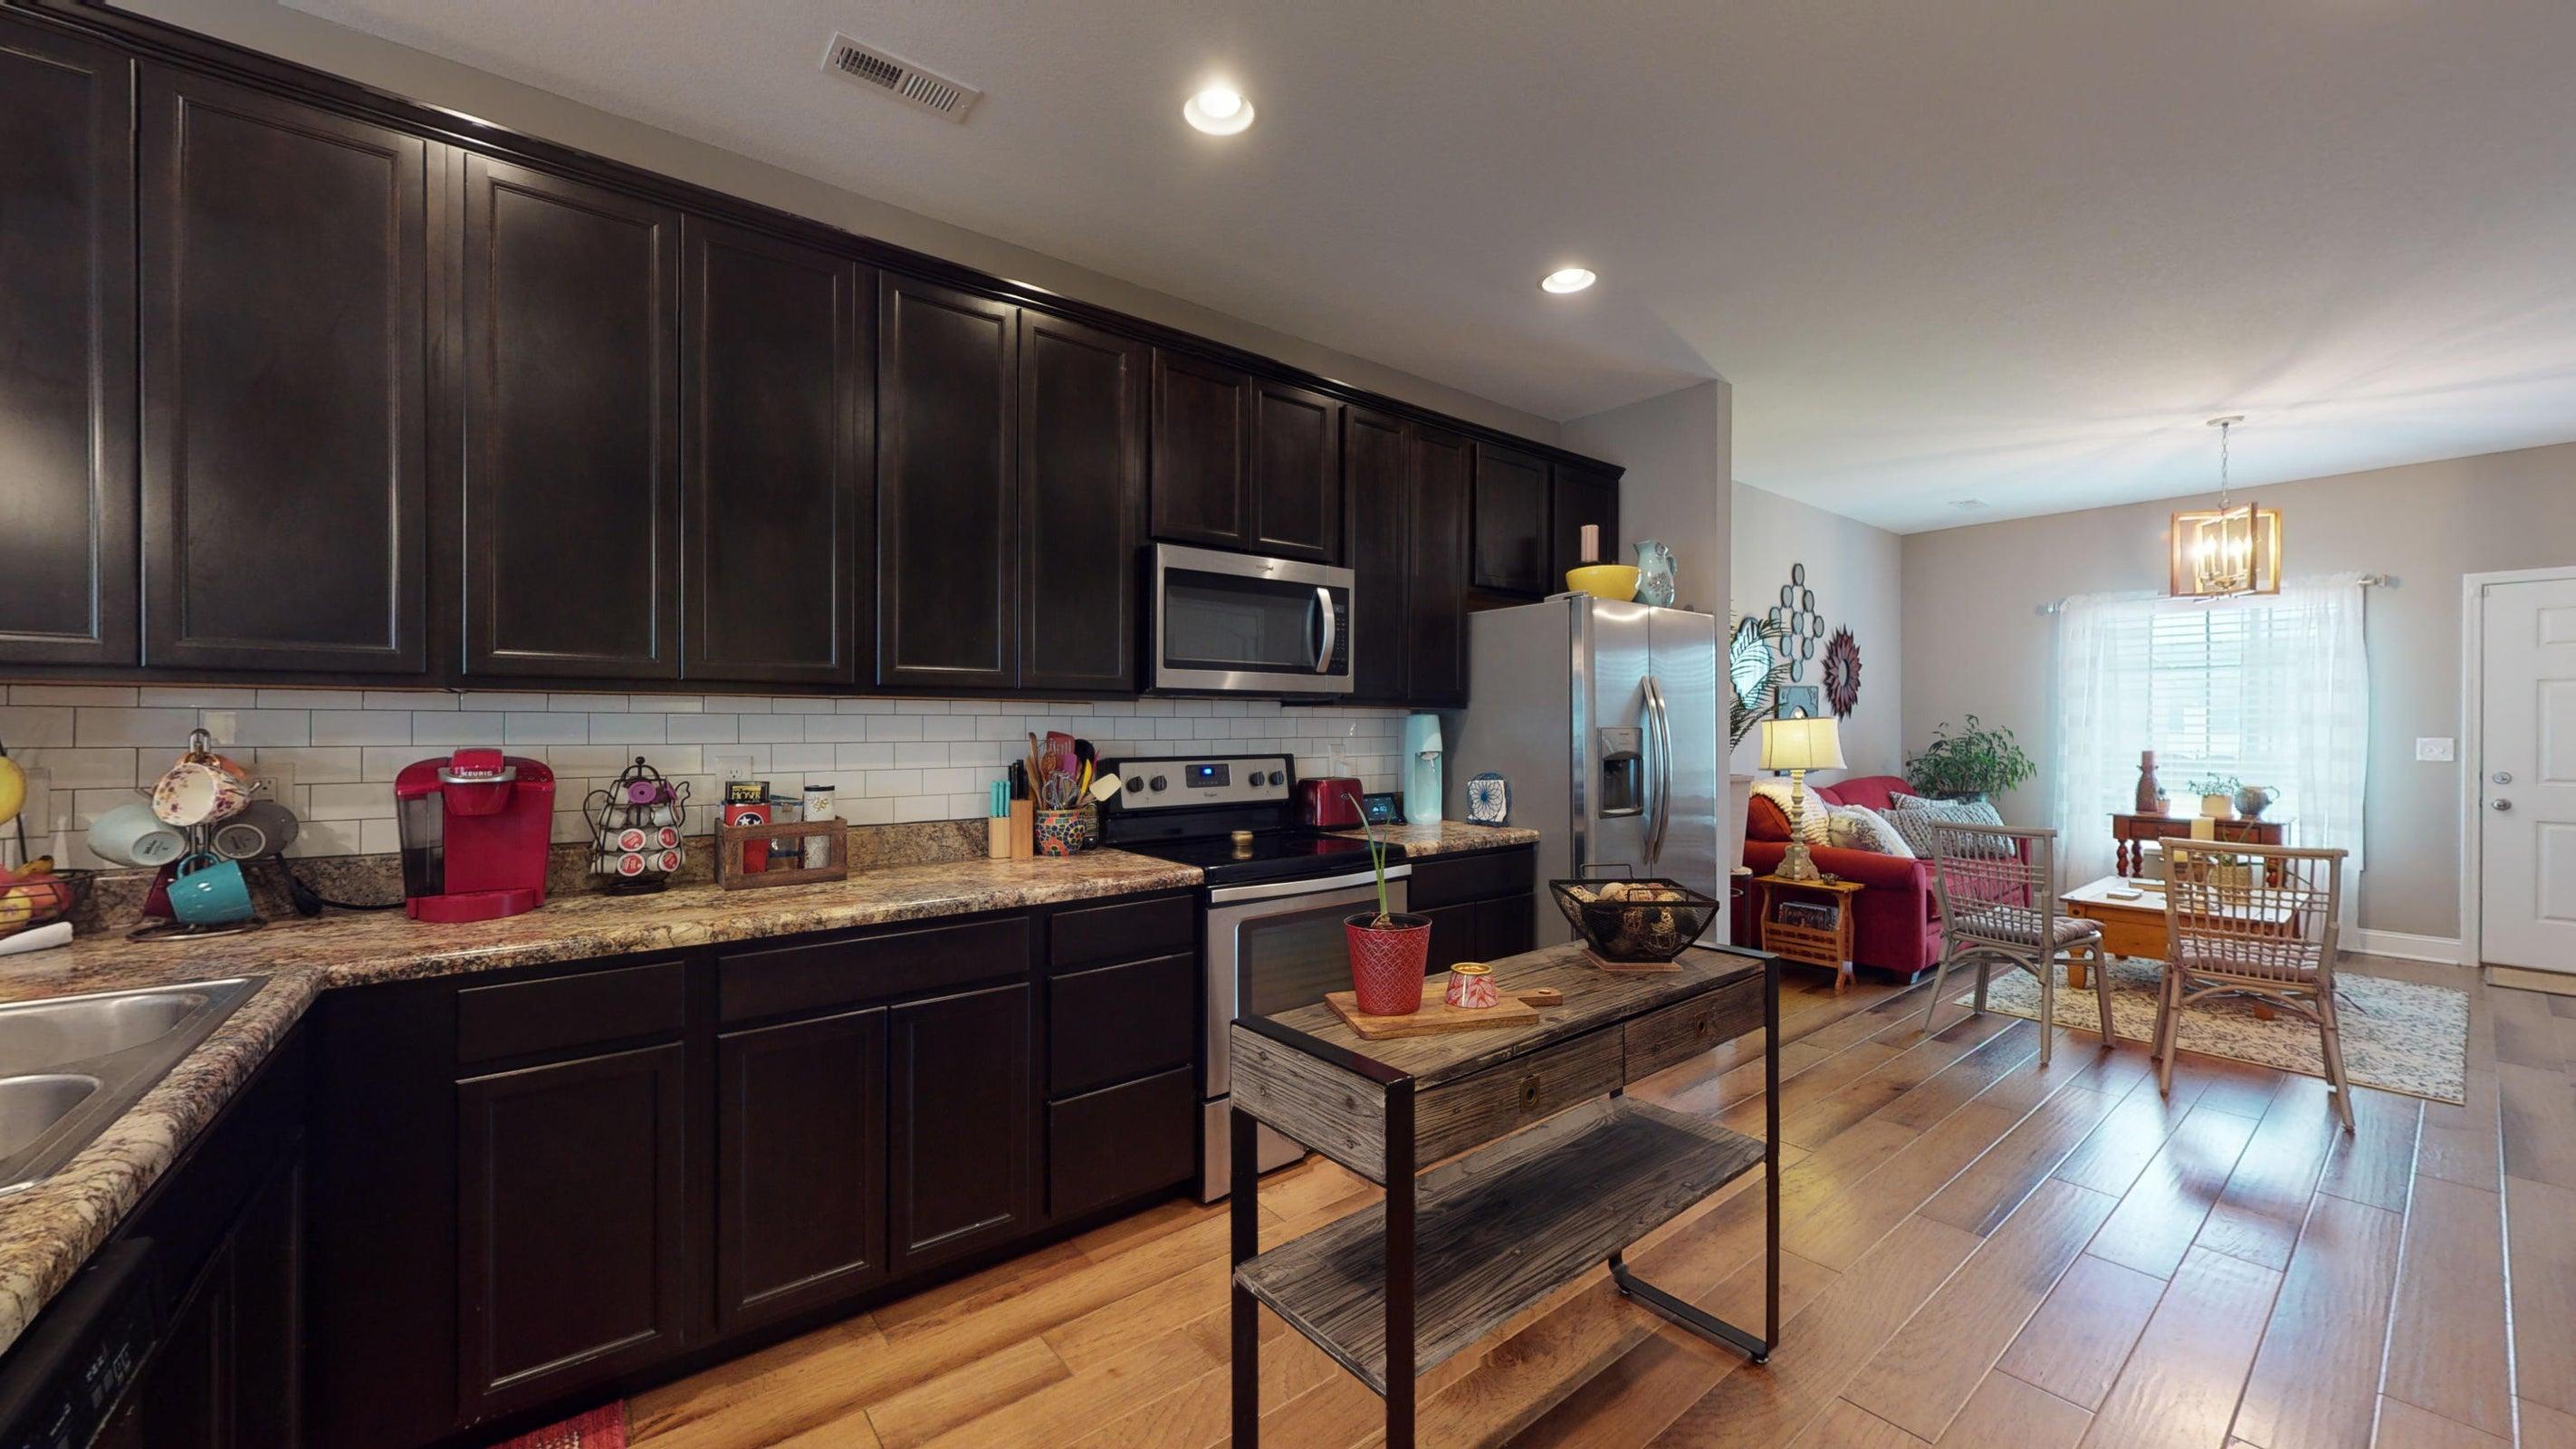 2352-Madeline-lane-Kitchen